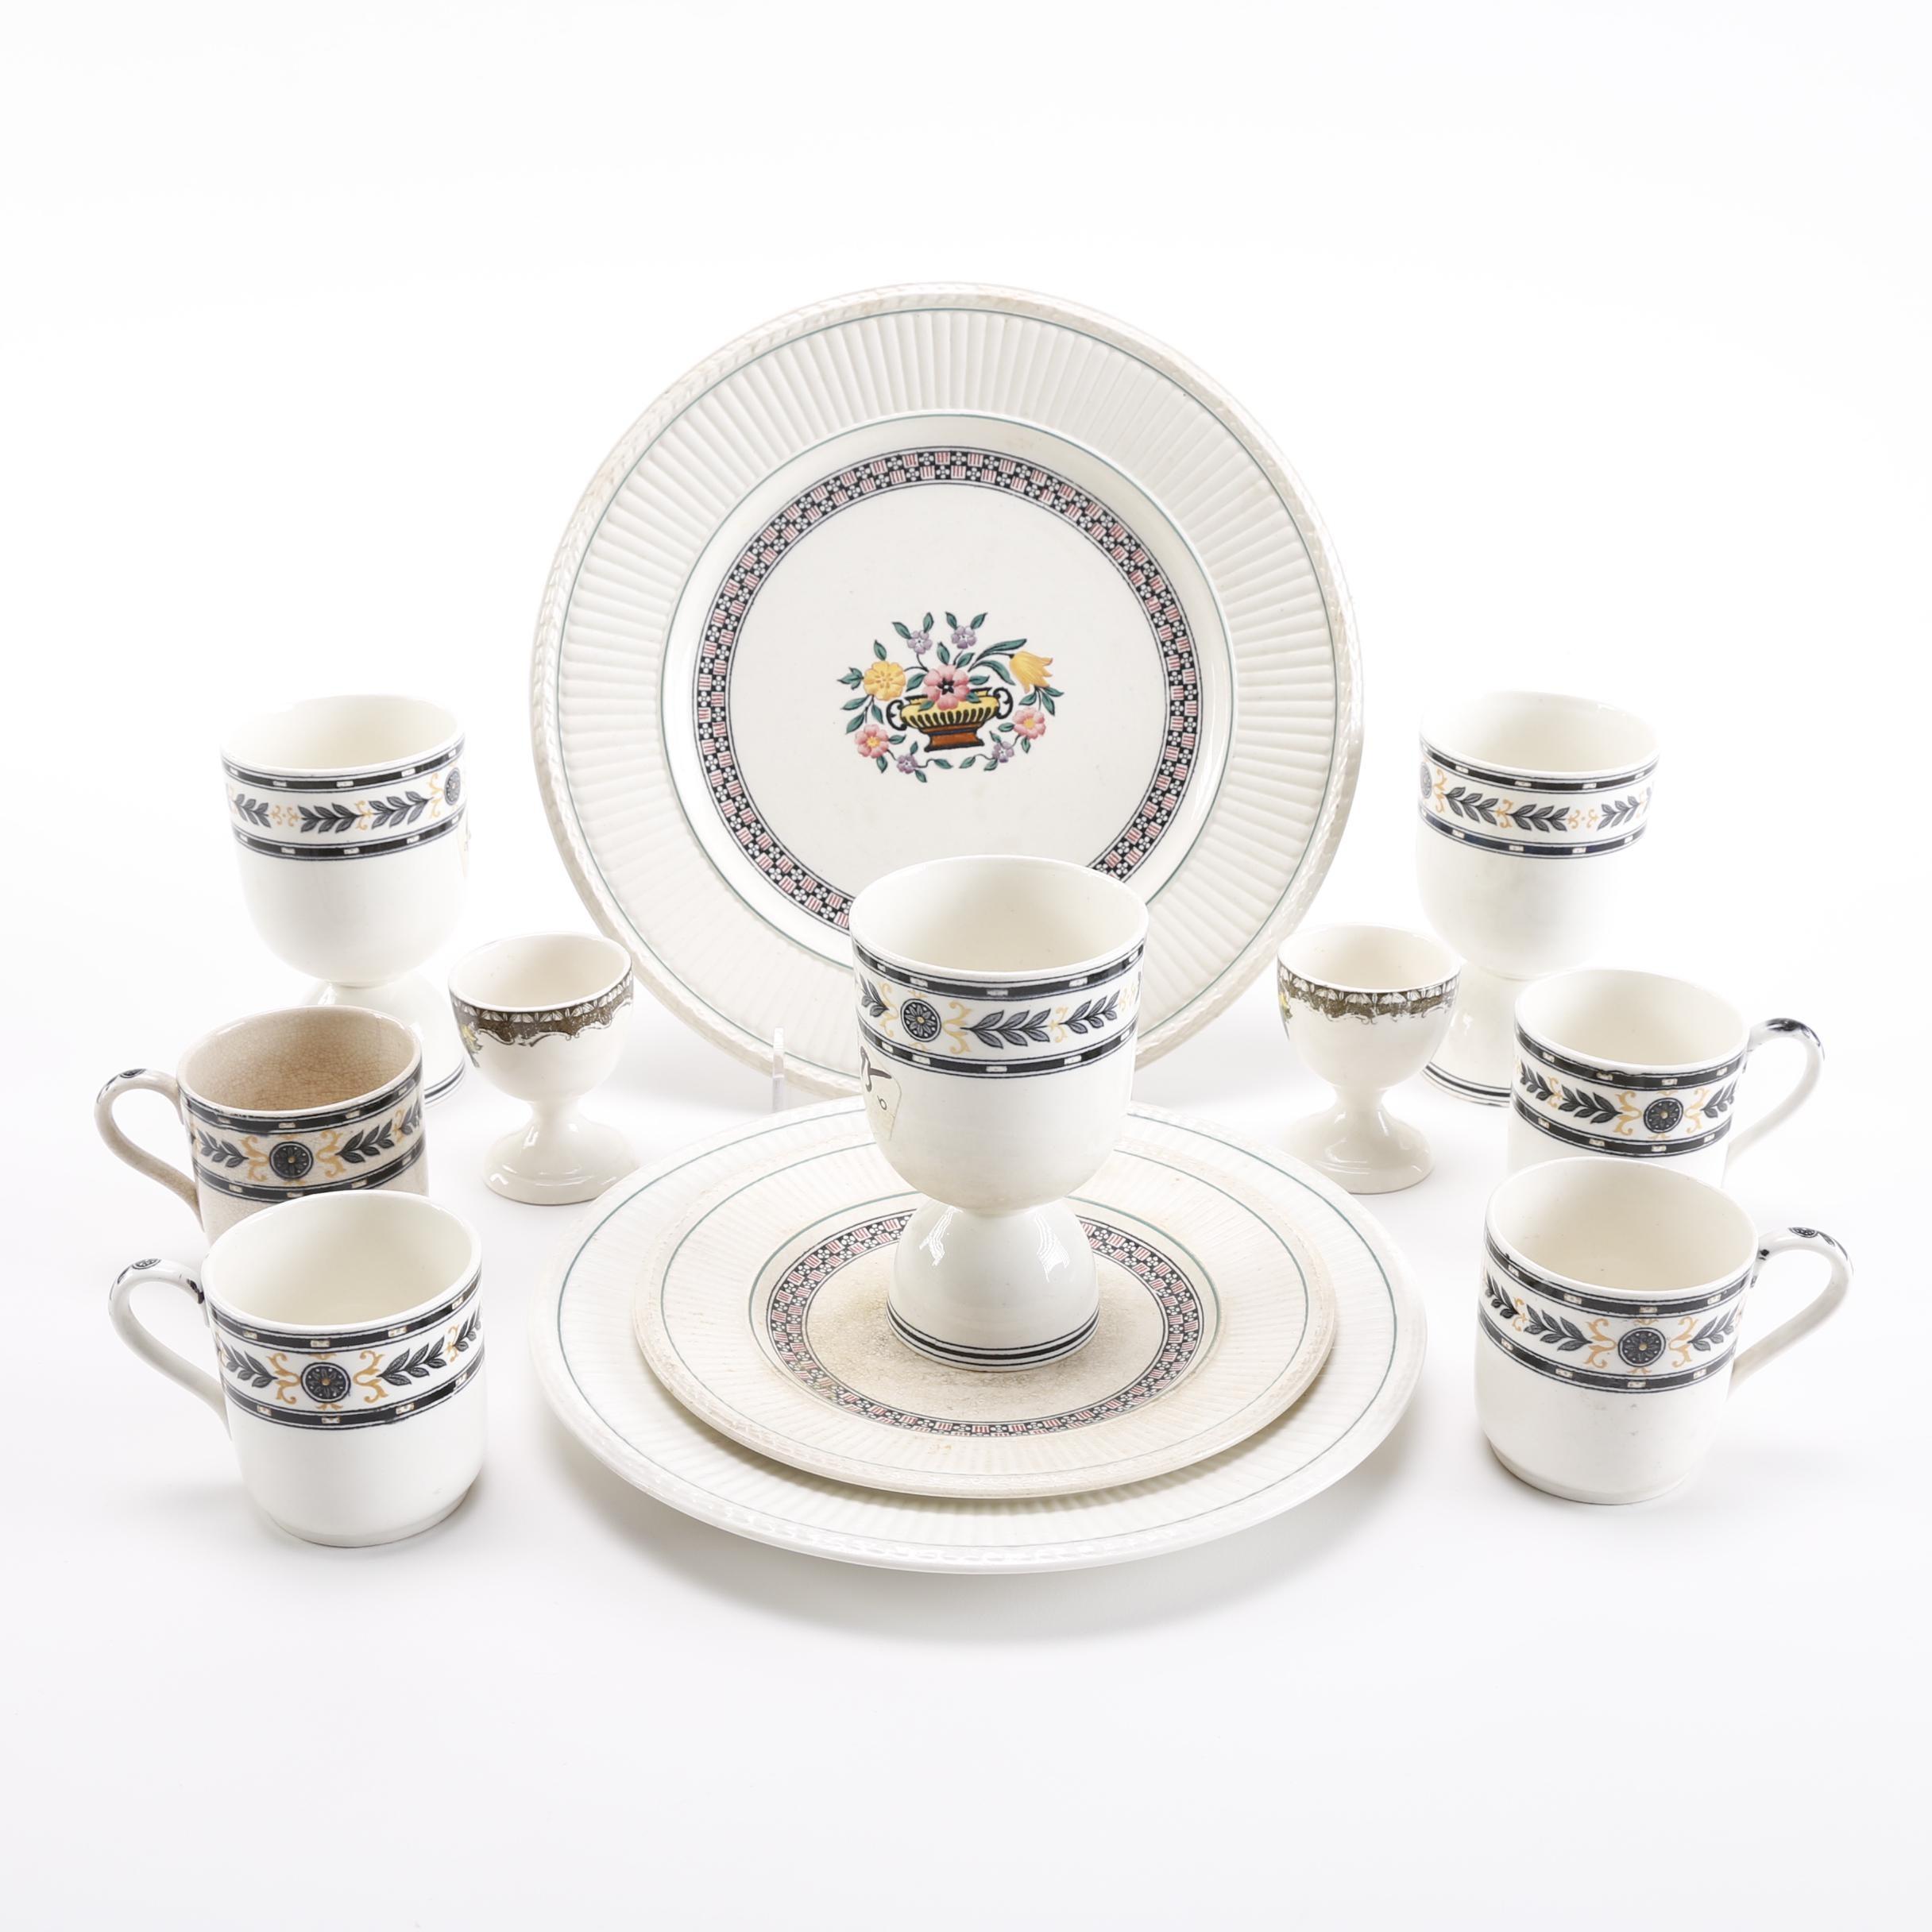 China Tableware Featuring Trentham Wedgwood